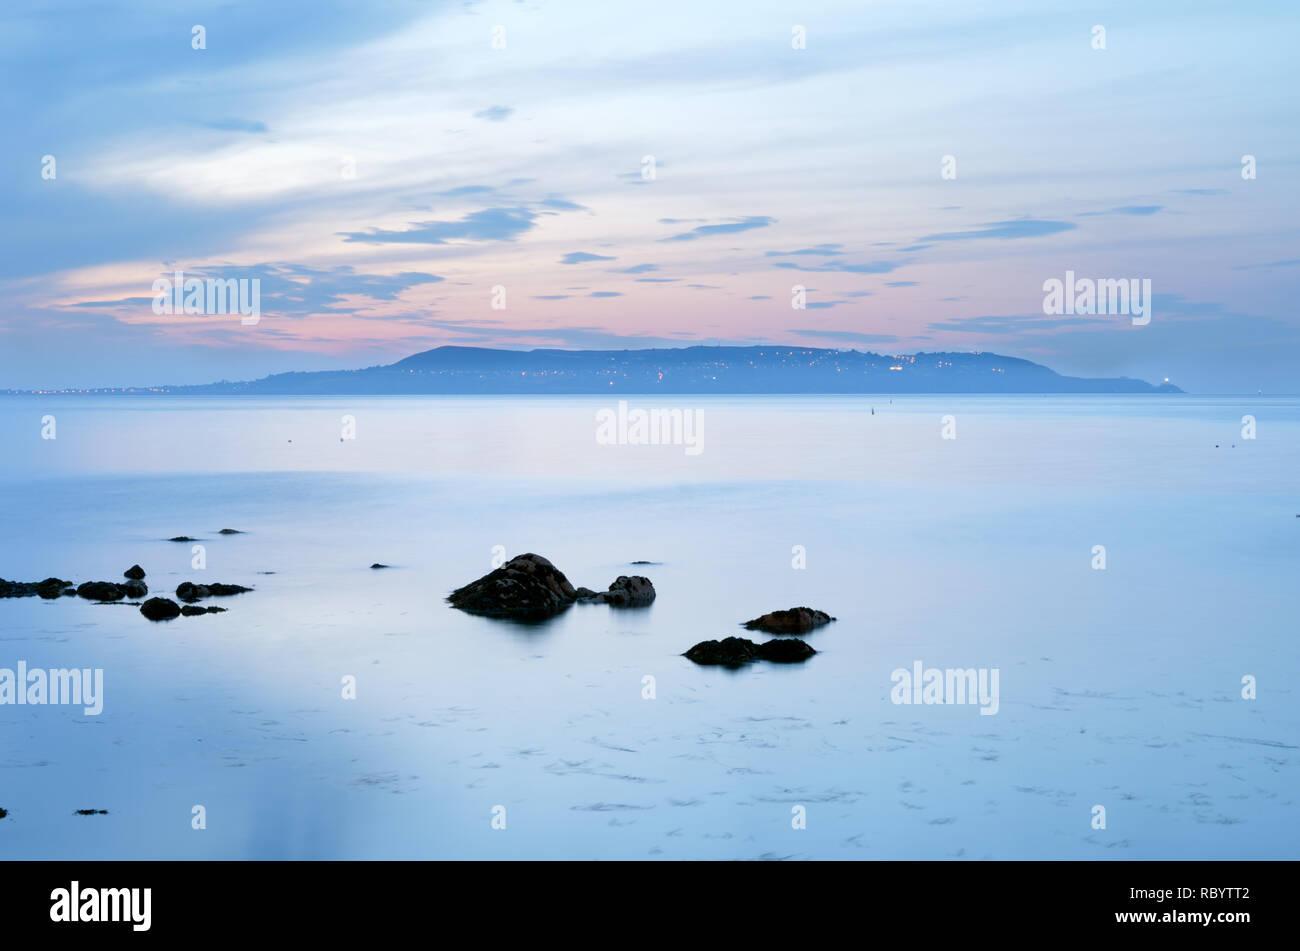 Flat calm sea,windless day,peninsula of howth,suburb of county dublin as seen across dublin bay,ireland. Stock Photo